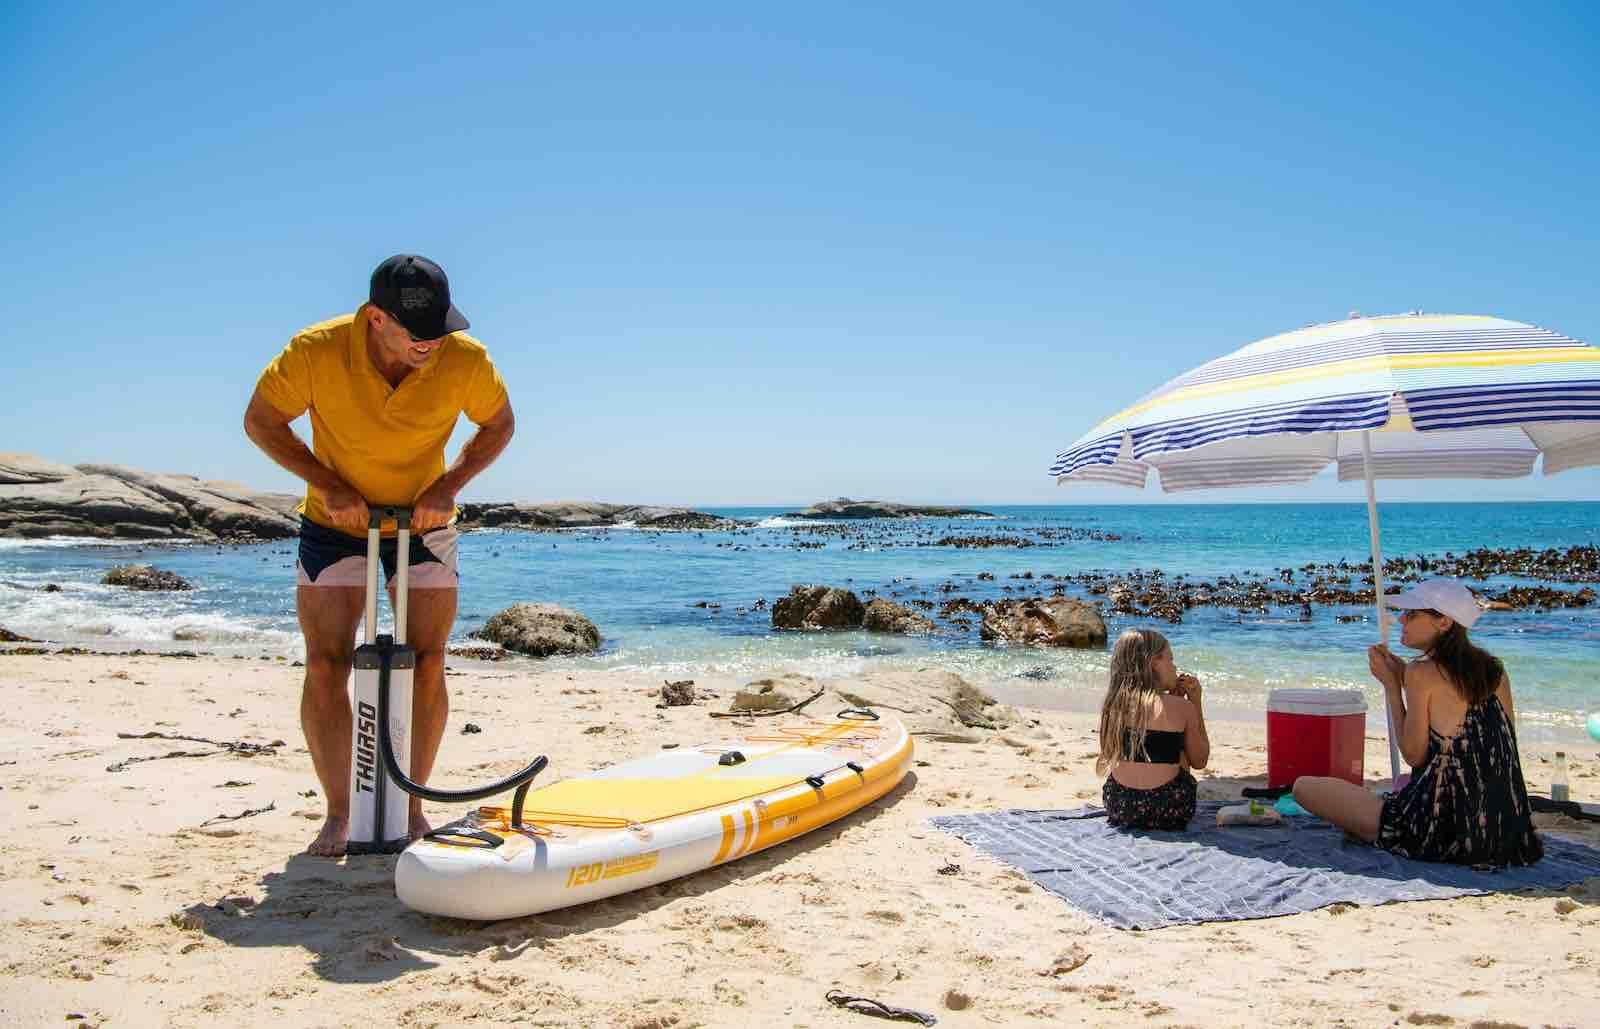 man inflates Thurso Surf Waterwalker all-around SUP on beach near two people under an umbrella